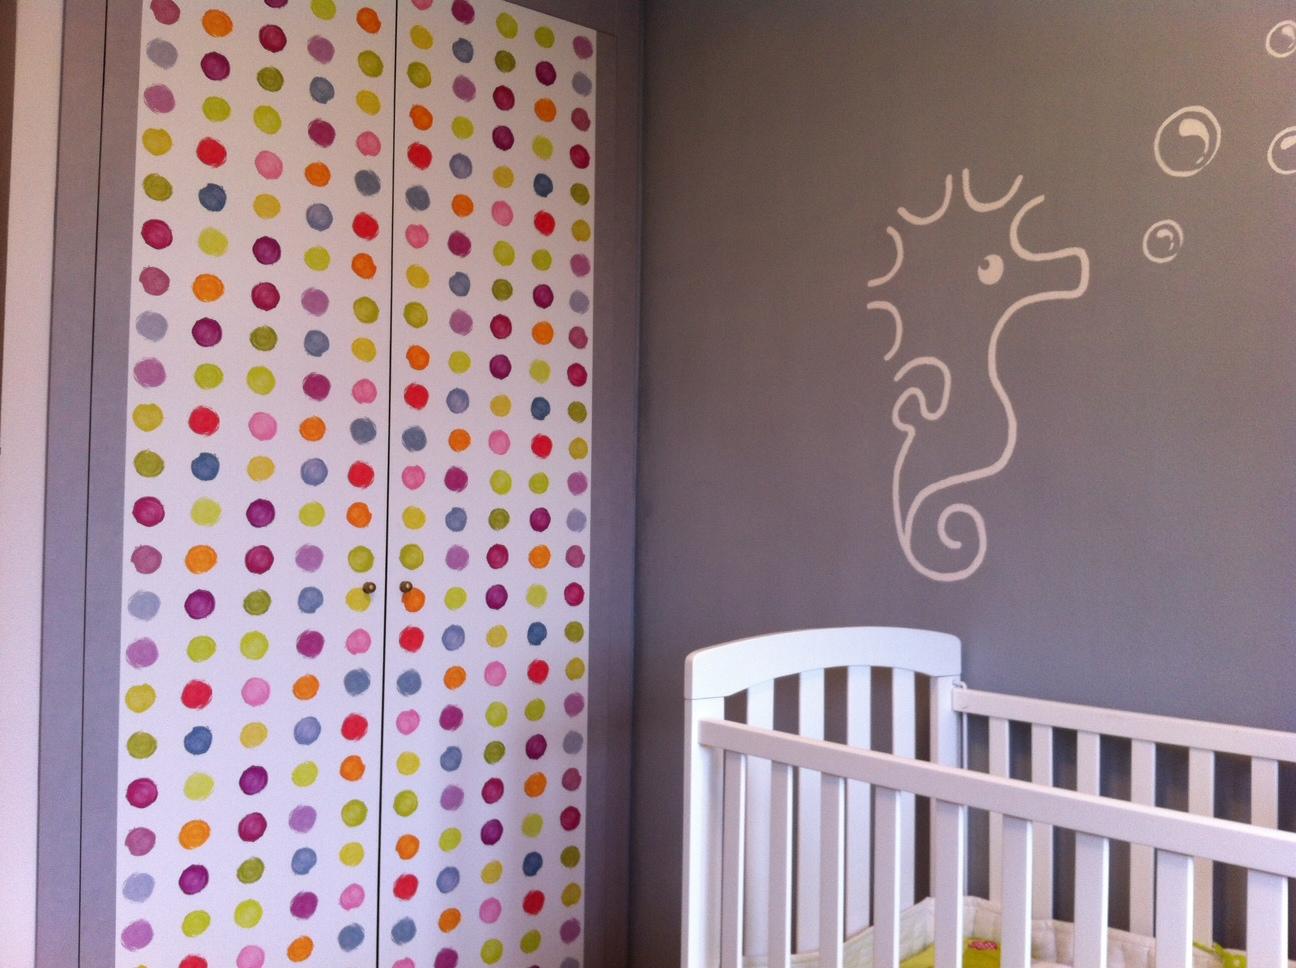 Diy x4duros 39 13 armario infantil de sandra for Papel pintado para forrar muebles